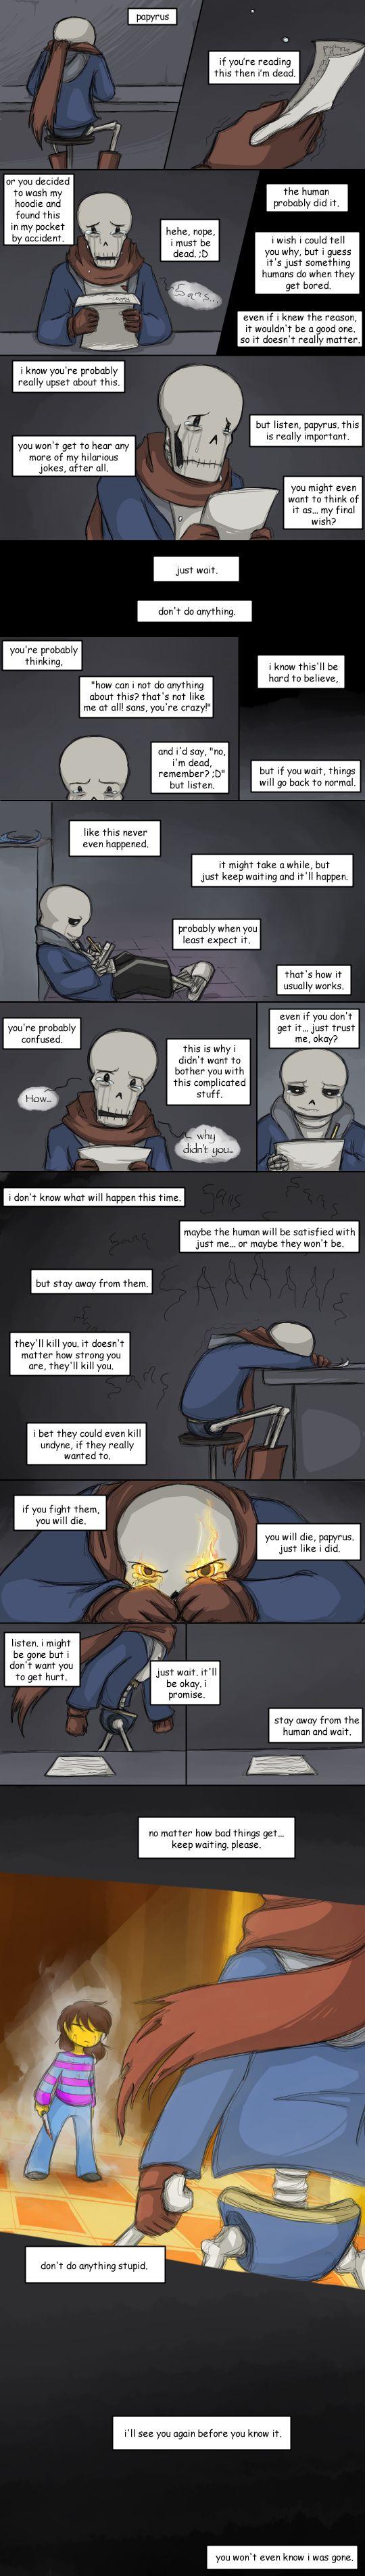 [UNDERTALE SPOILERS] it'll be okay by zarla.deviantart.com on @deviantart   AU where Papyrus is the last man standing.